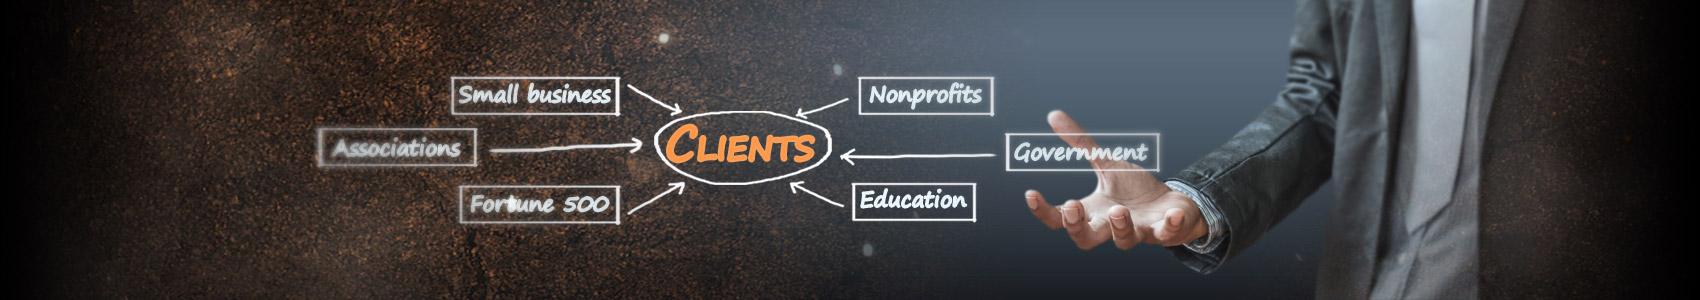 banner_clients